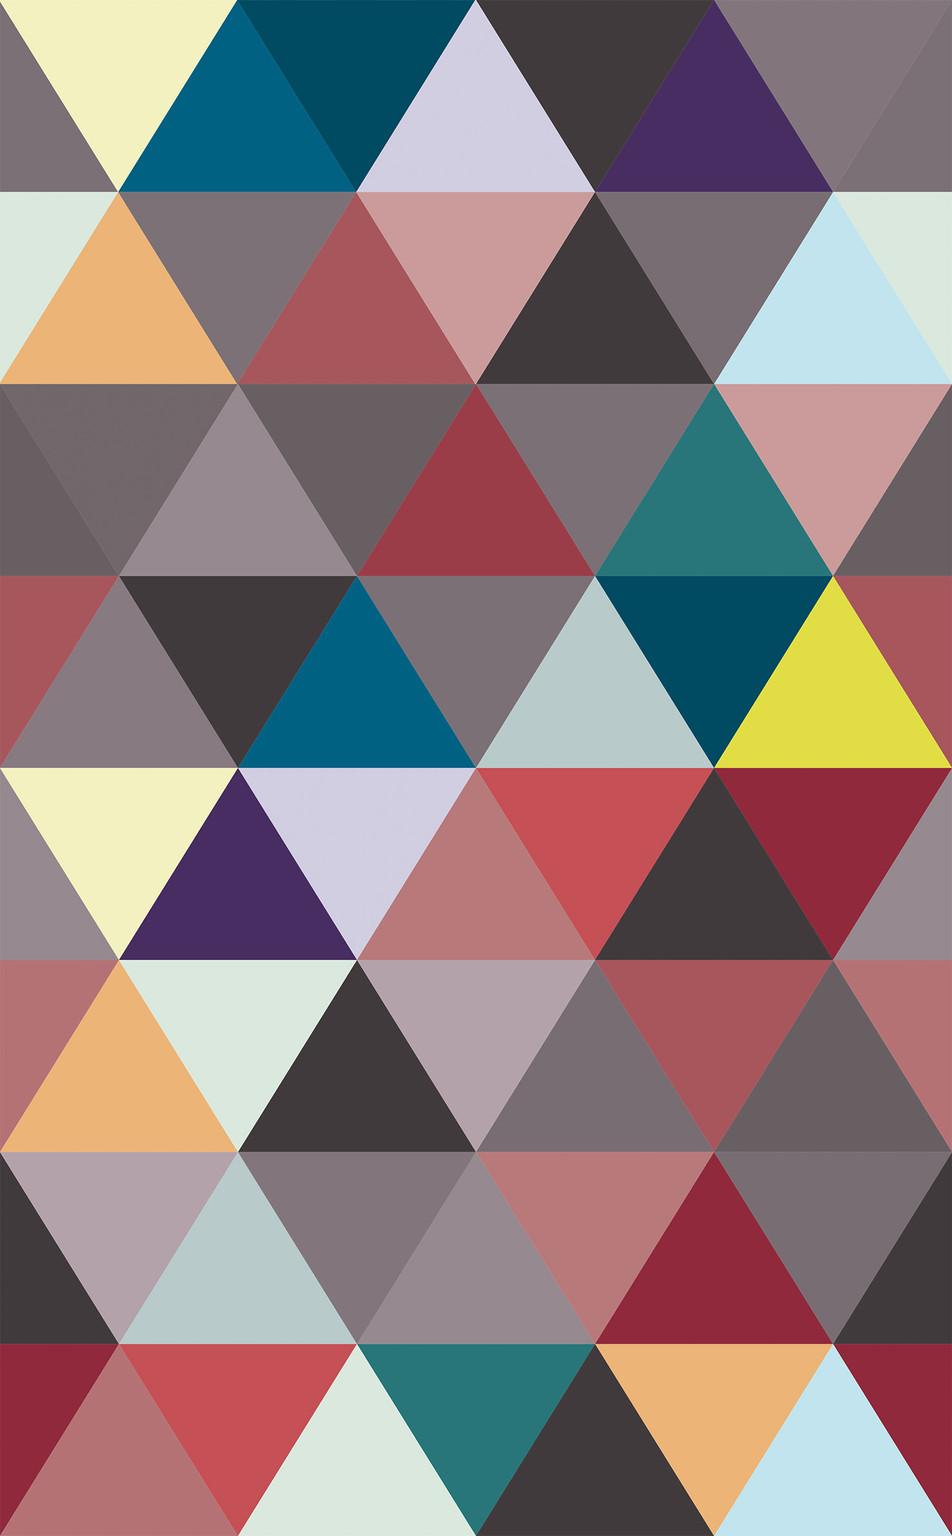 Triangle No. 02 Brown